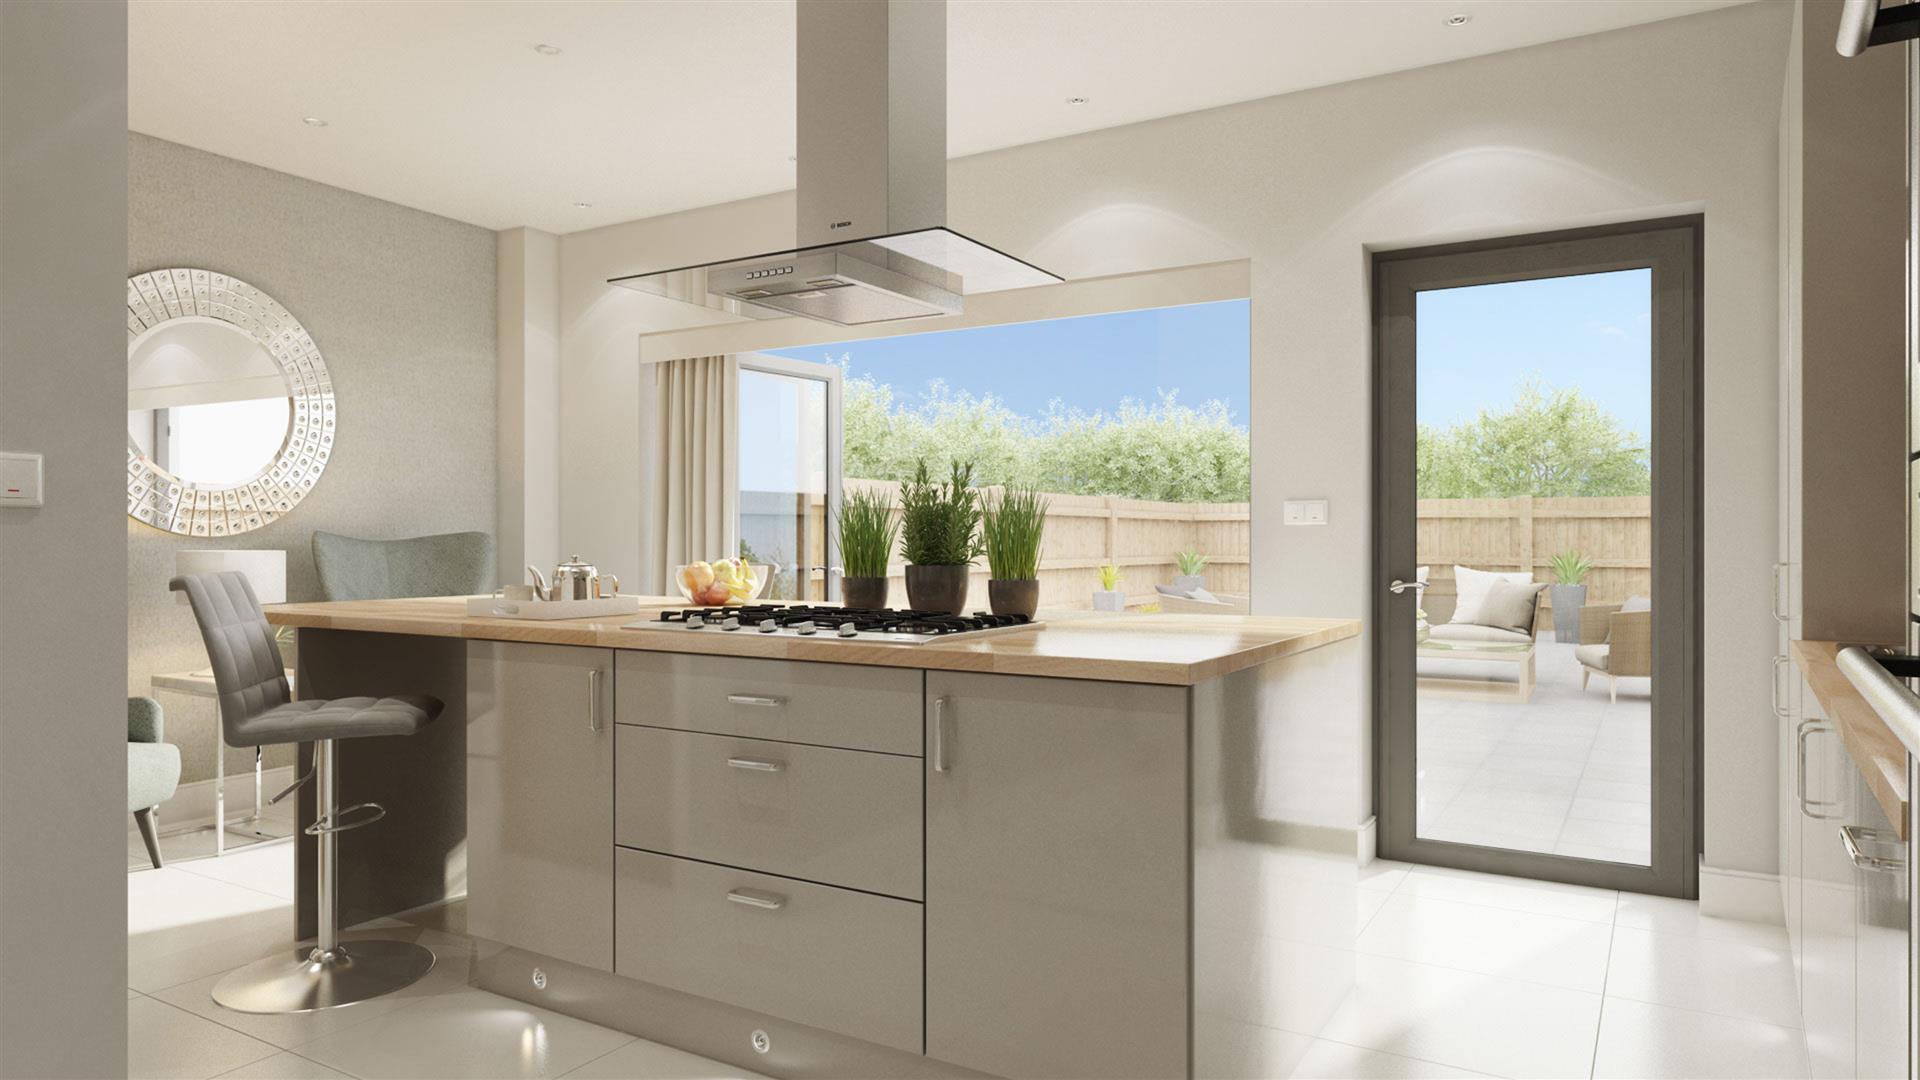 St Modwen Homes,Appliance